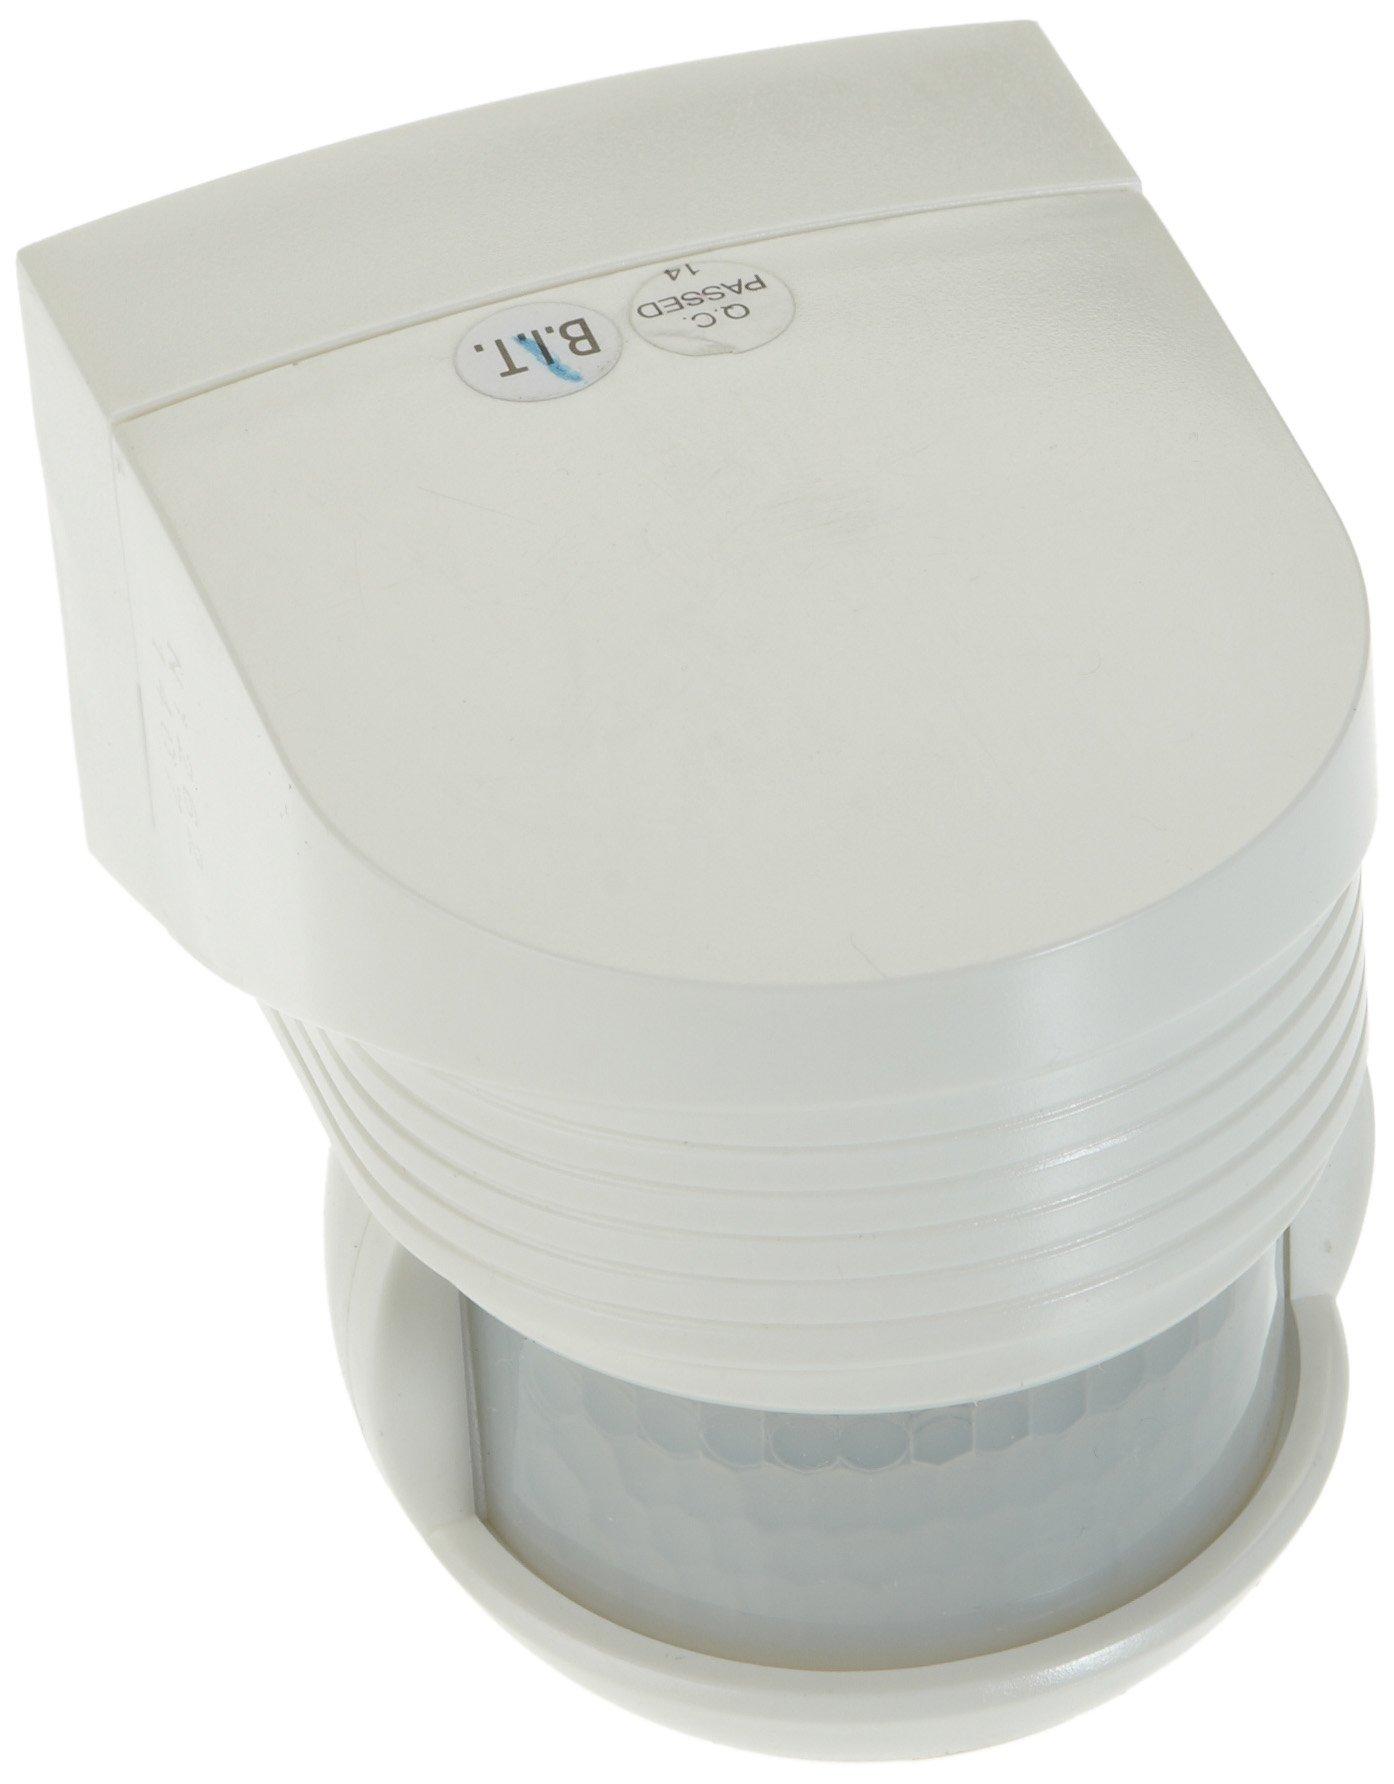 B.E.G LC-Click 140 91001 Motion Detector White